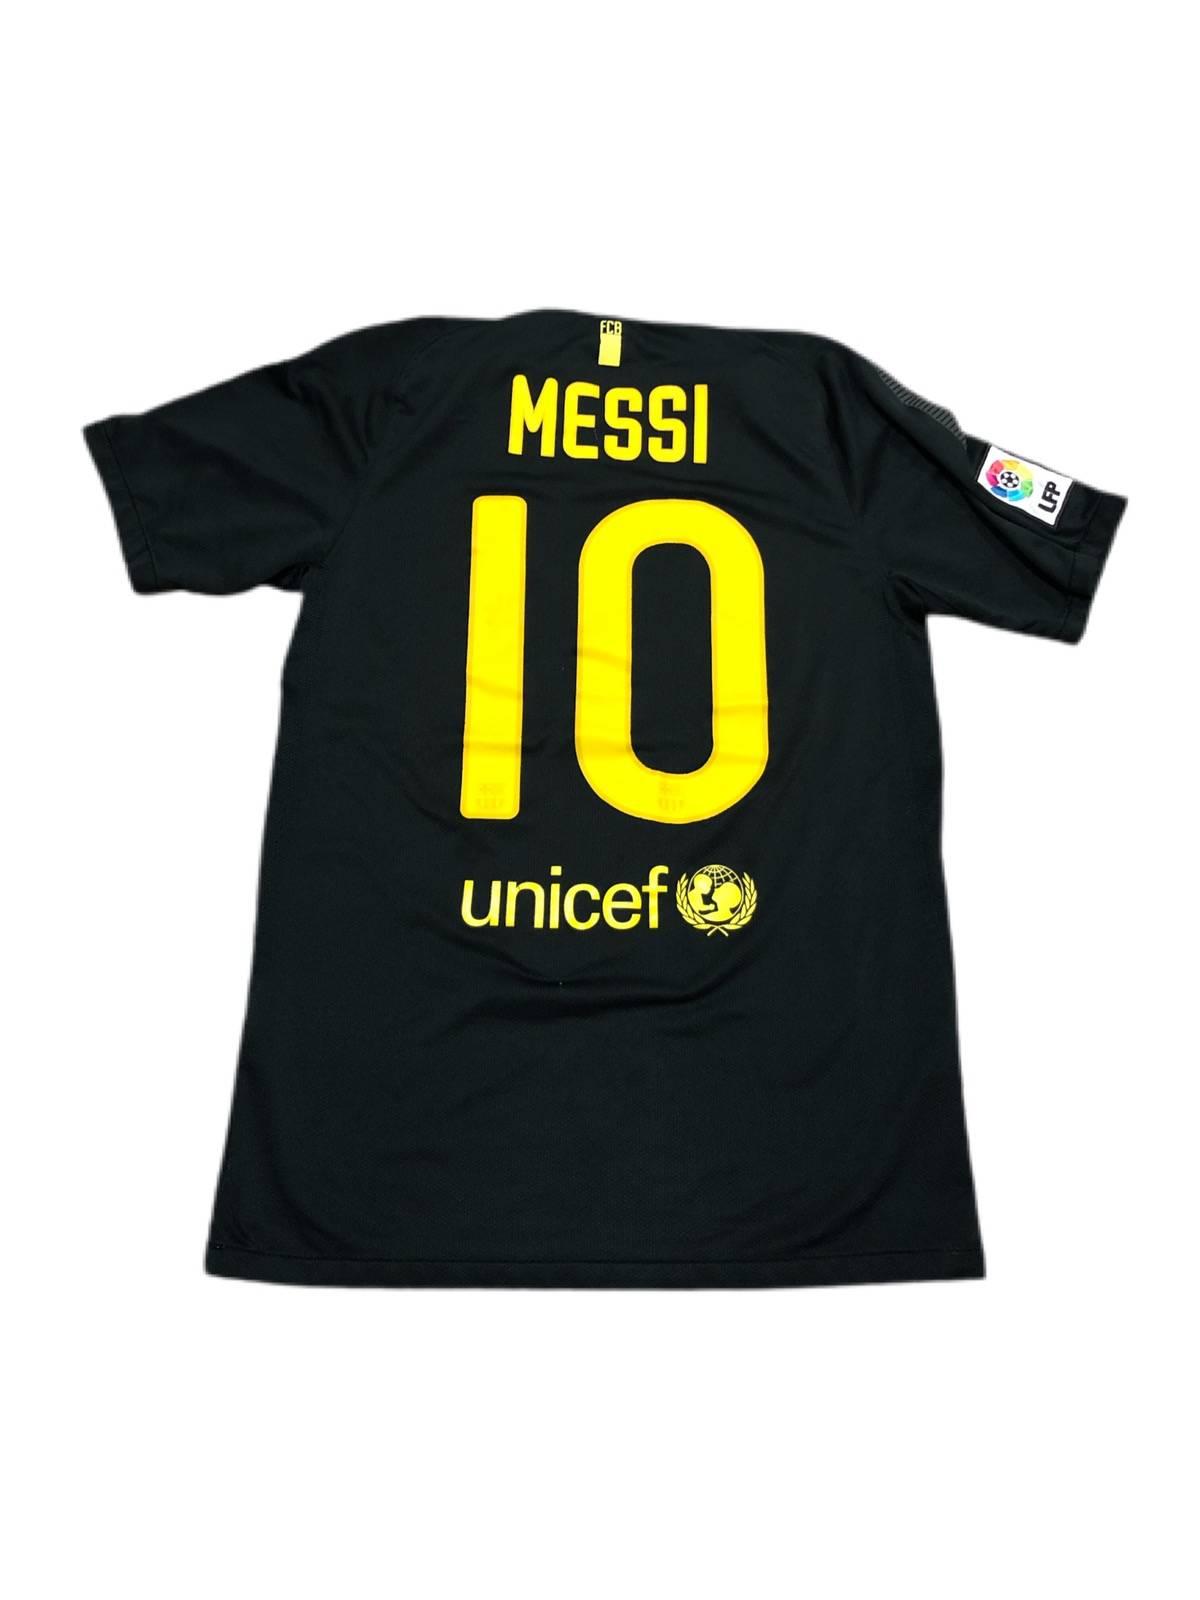 Nike Nike Fc Barcelona Messi Jersey Grailed